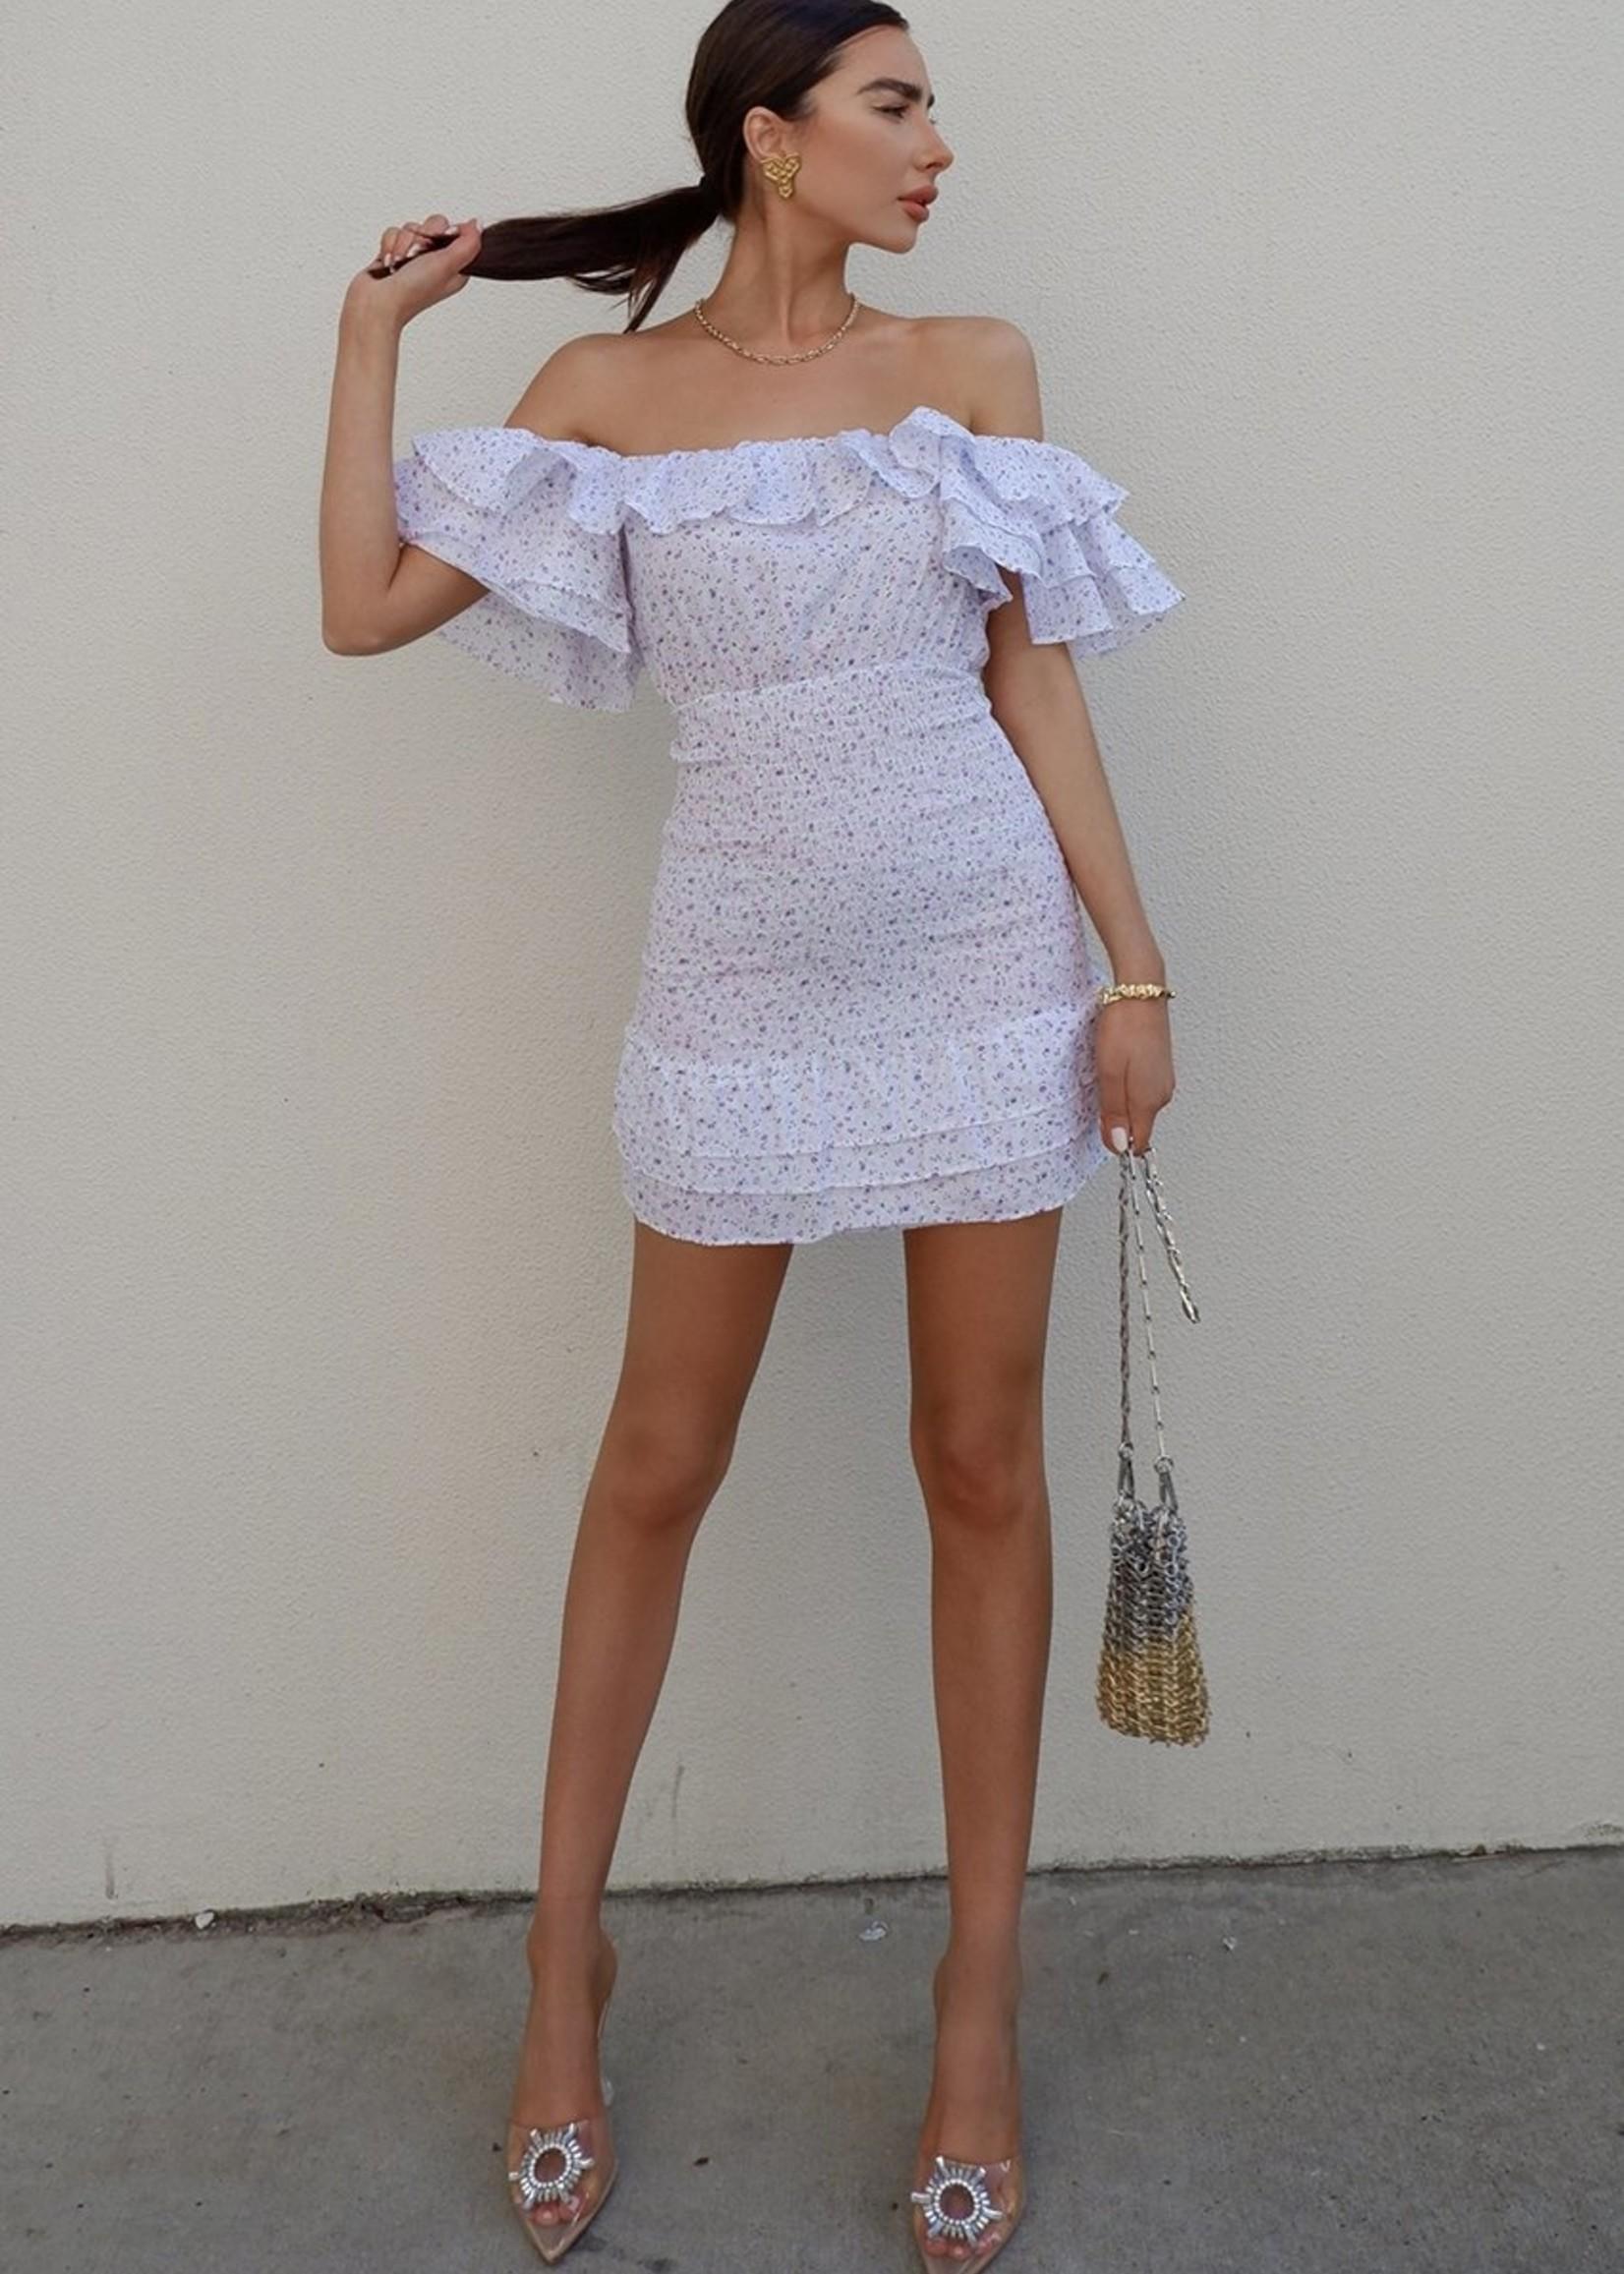 Flamino dress